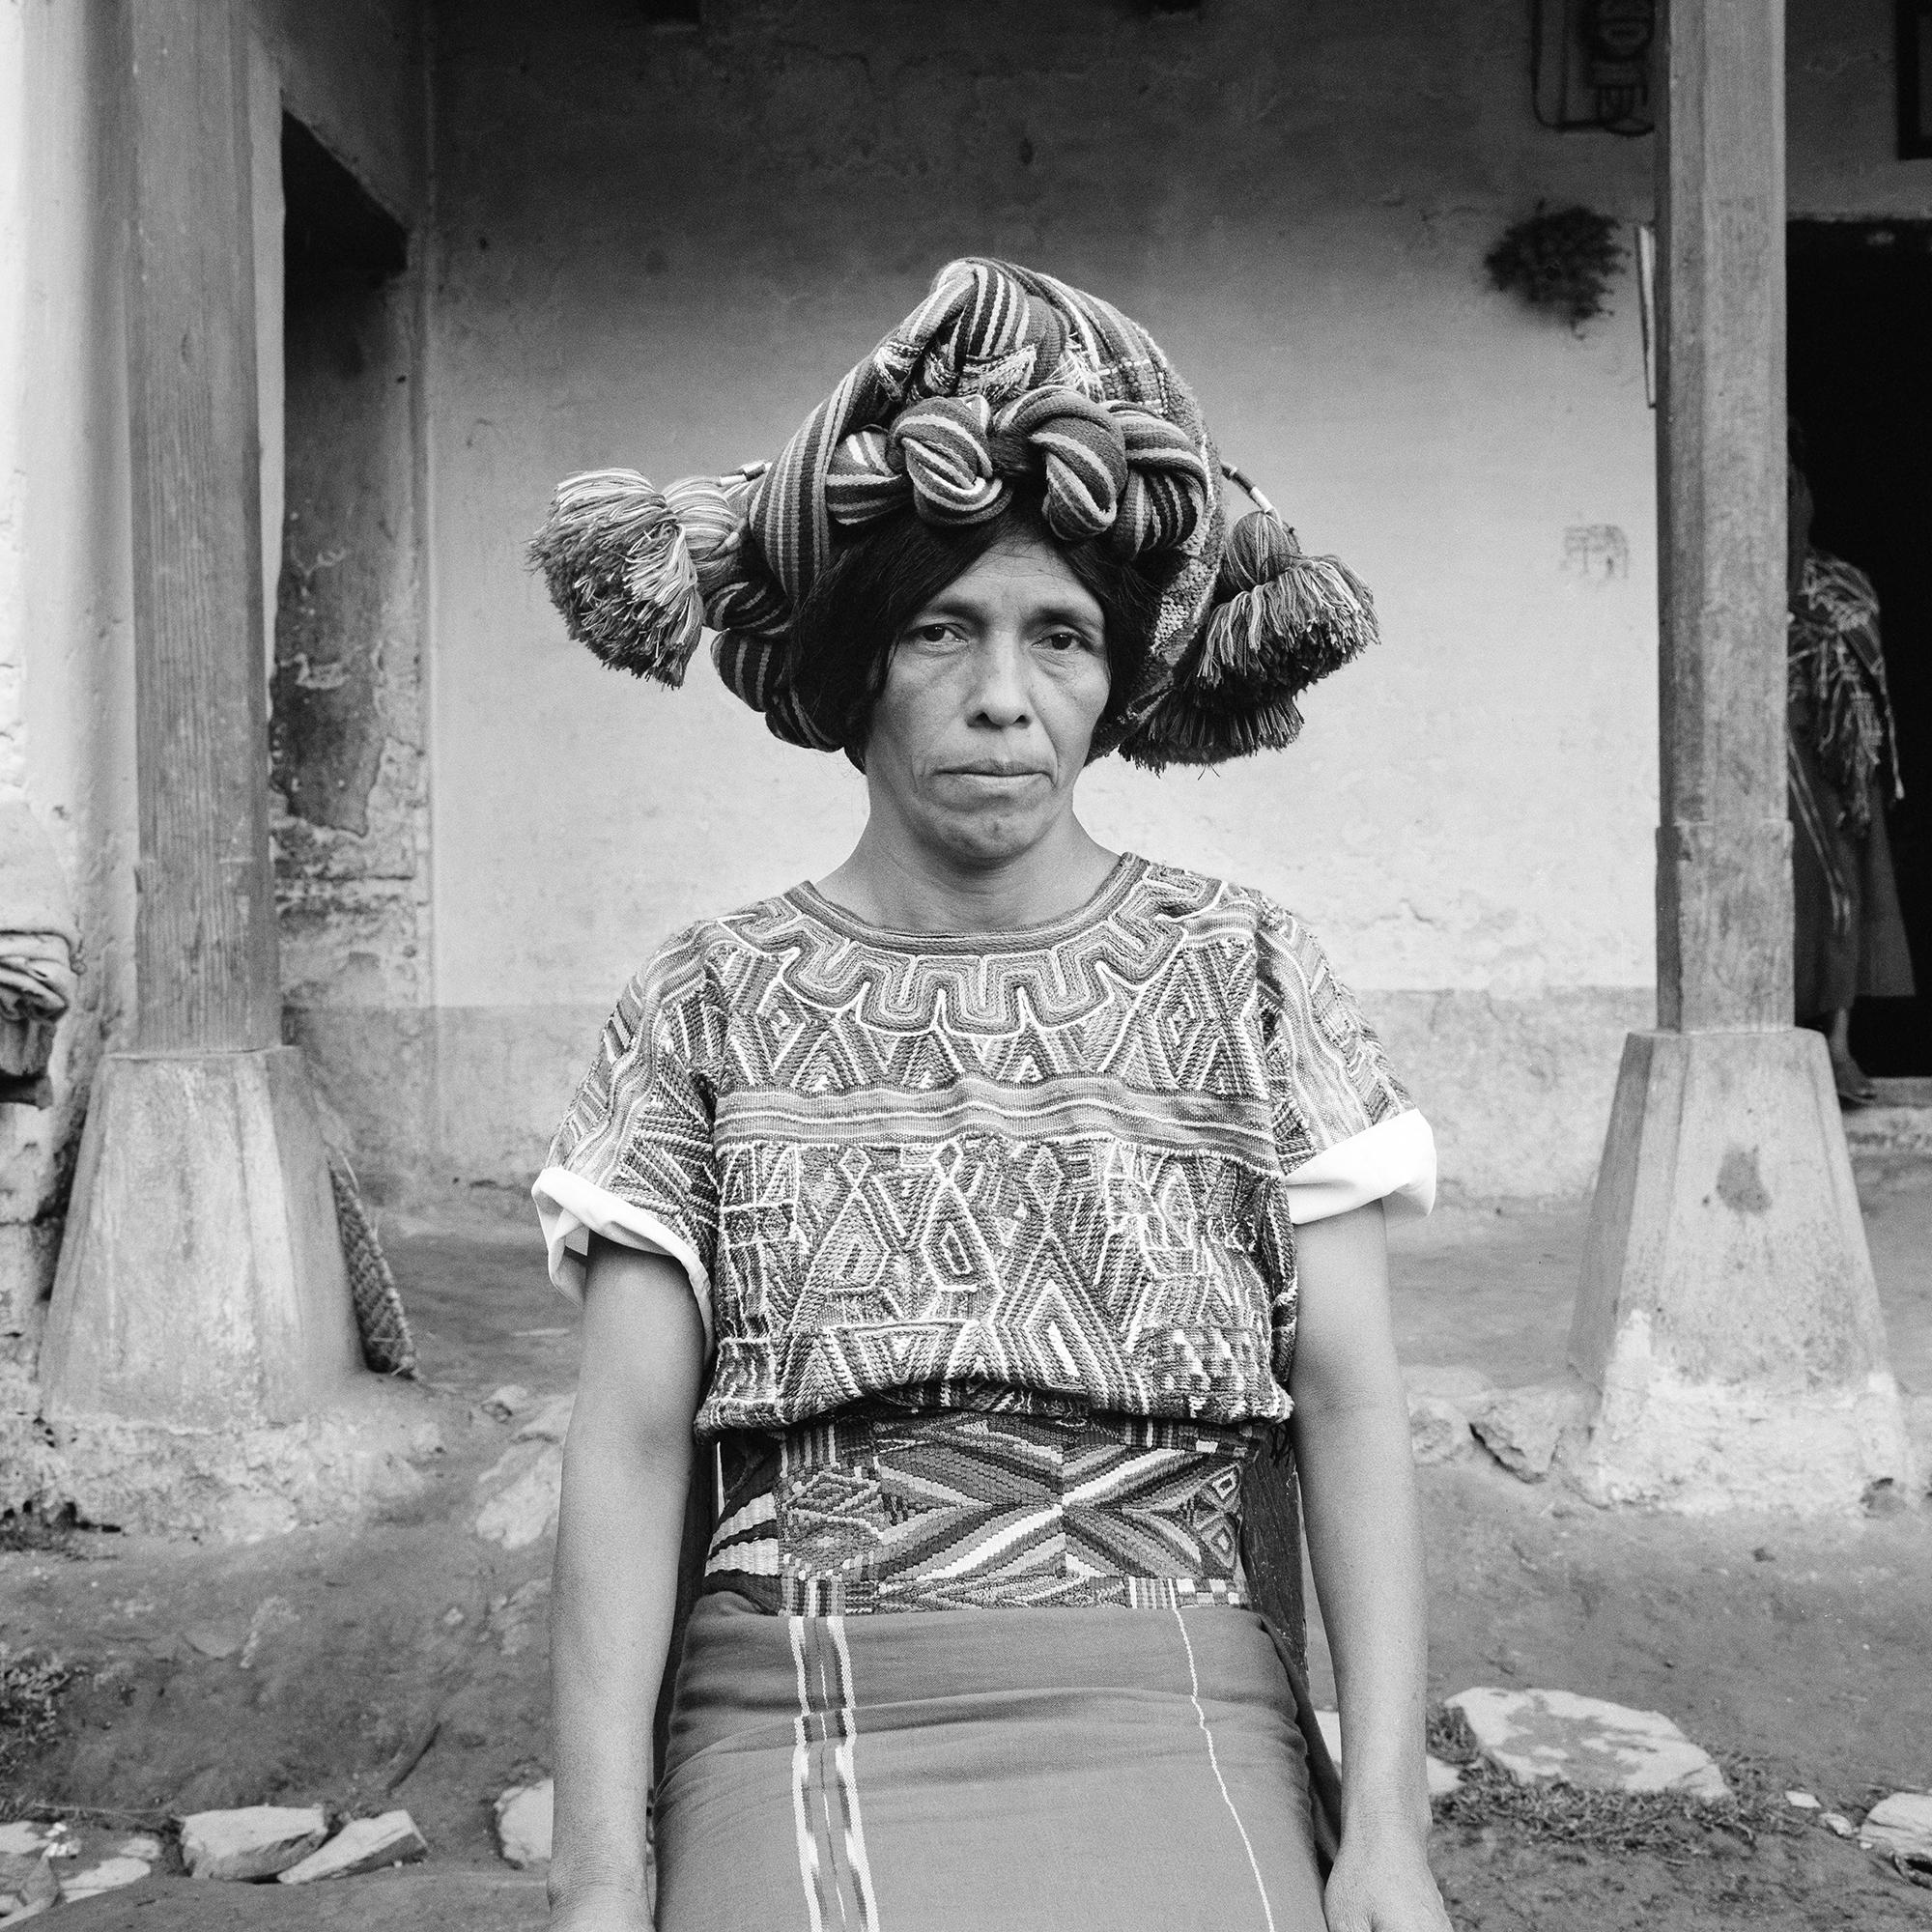 Petrona Brito, an Ixil Maya woman wearing a traditional head dress, sits for a picture in Nebaj, Guatemala, January 1, 1984.